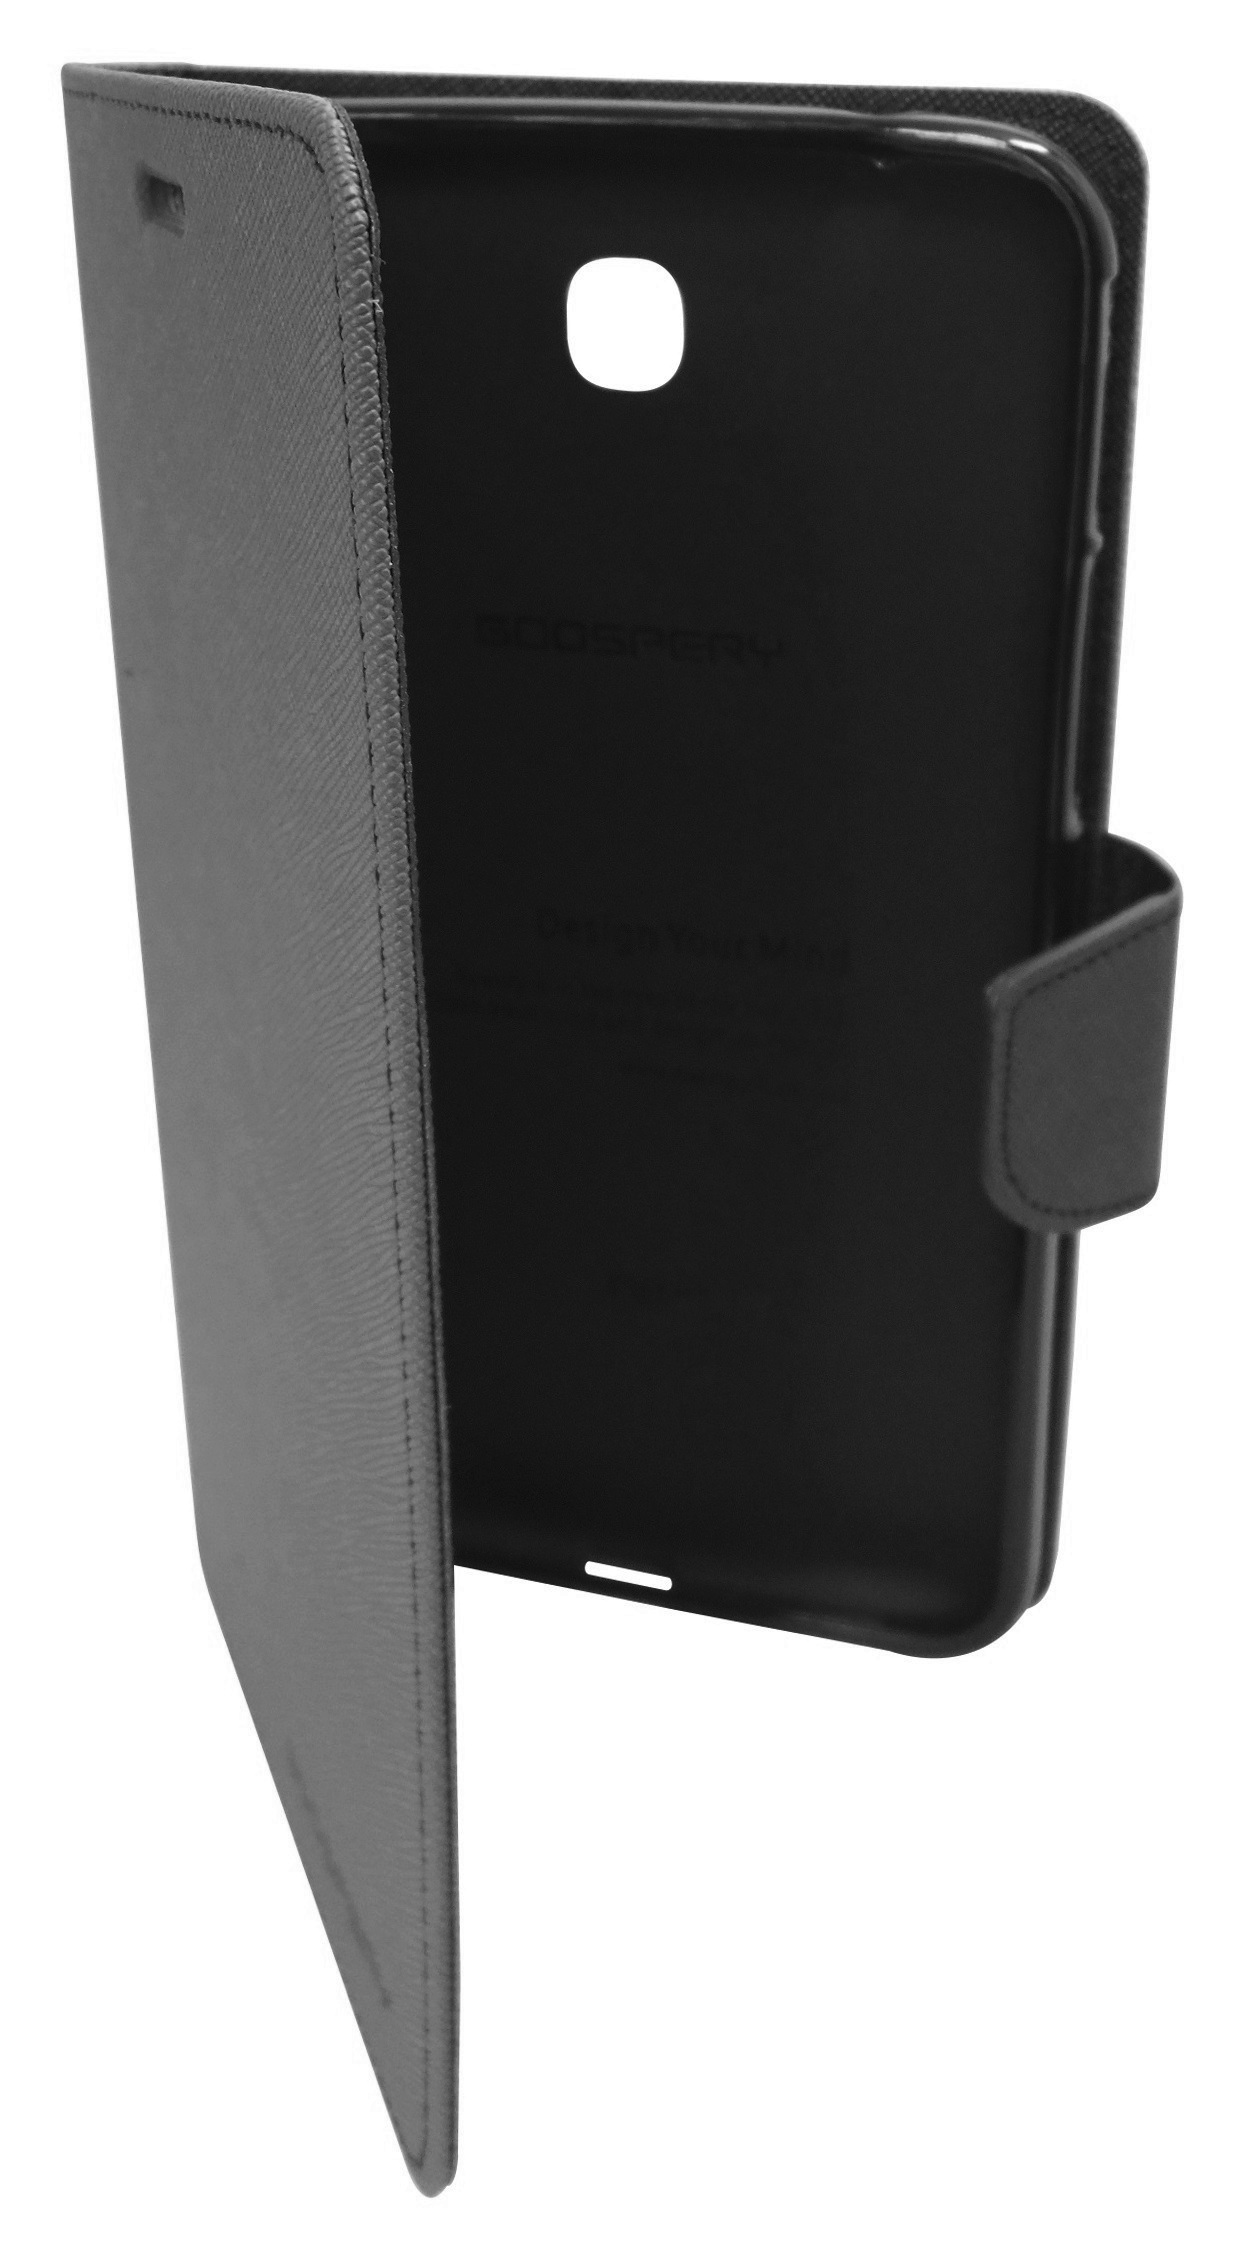 Husa tip carte Mercury Goospery Fancy Diary neagra pentru Samsung Galaxy Tab 3 P3200 (SM-T211) / P3210 (SM-T210)